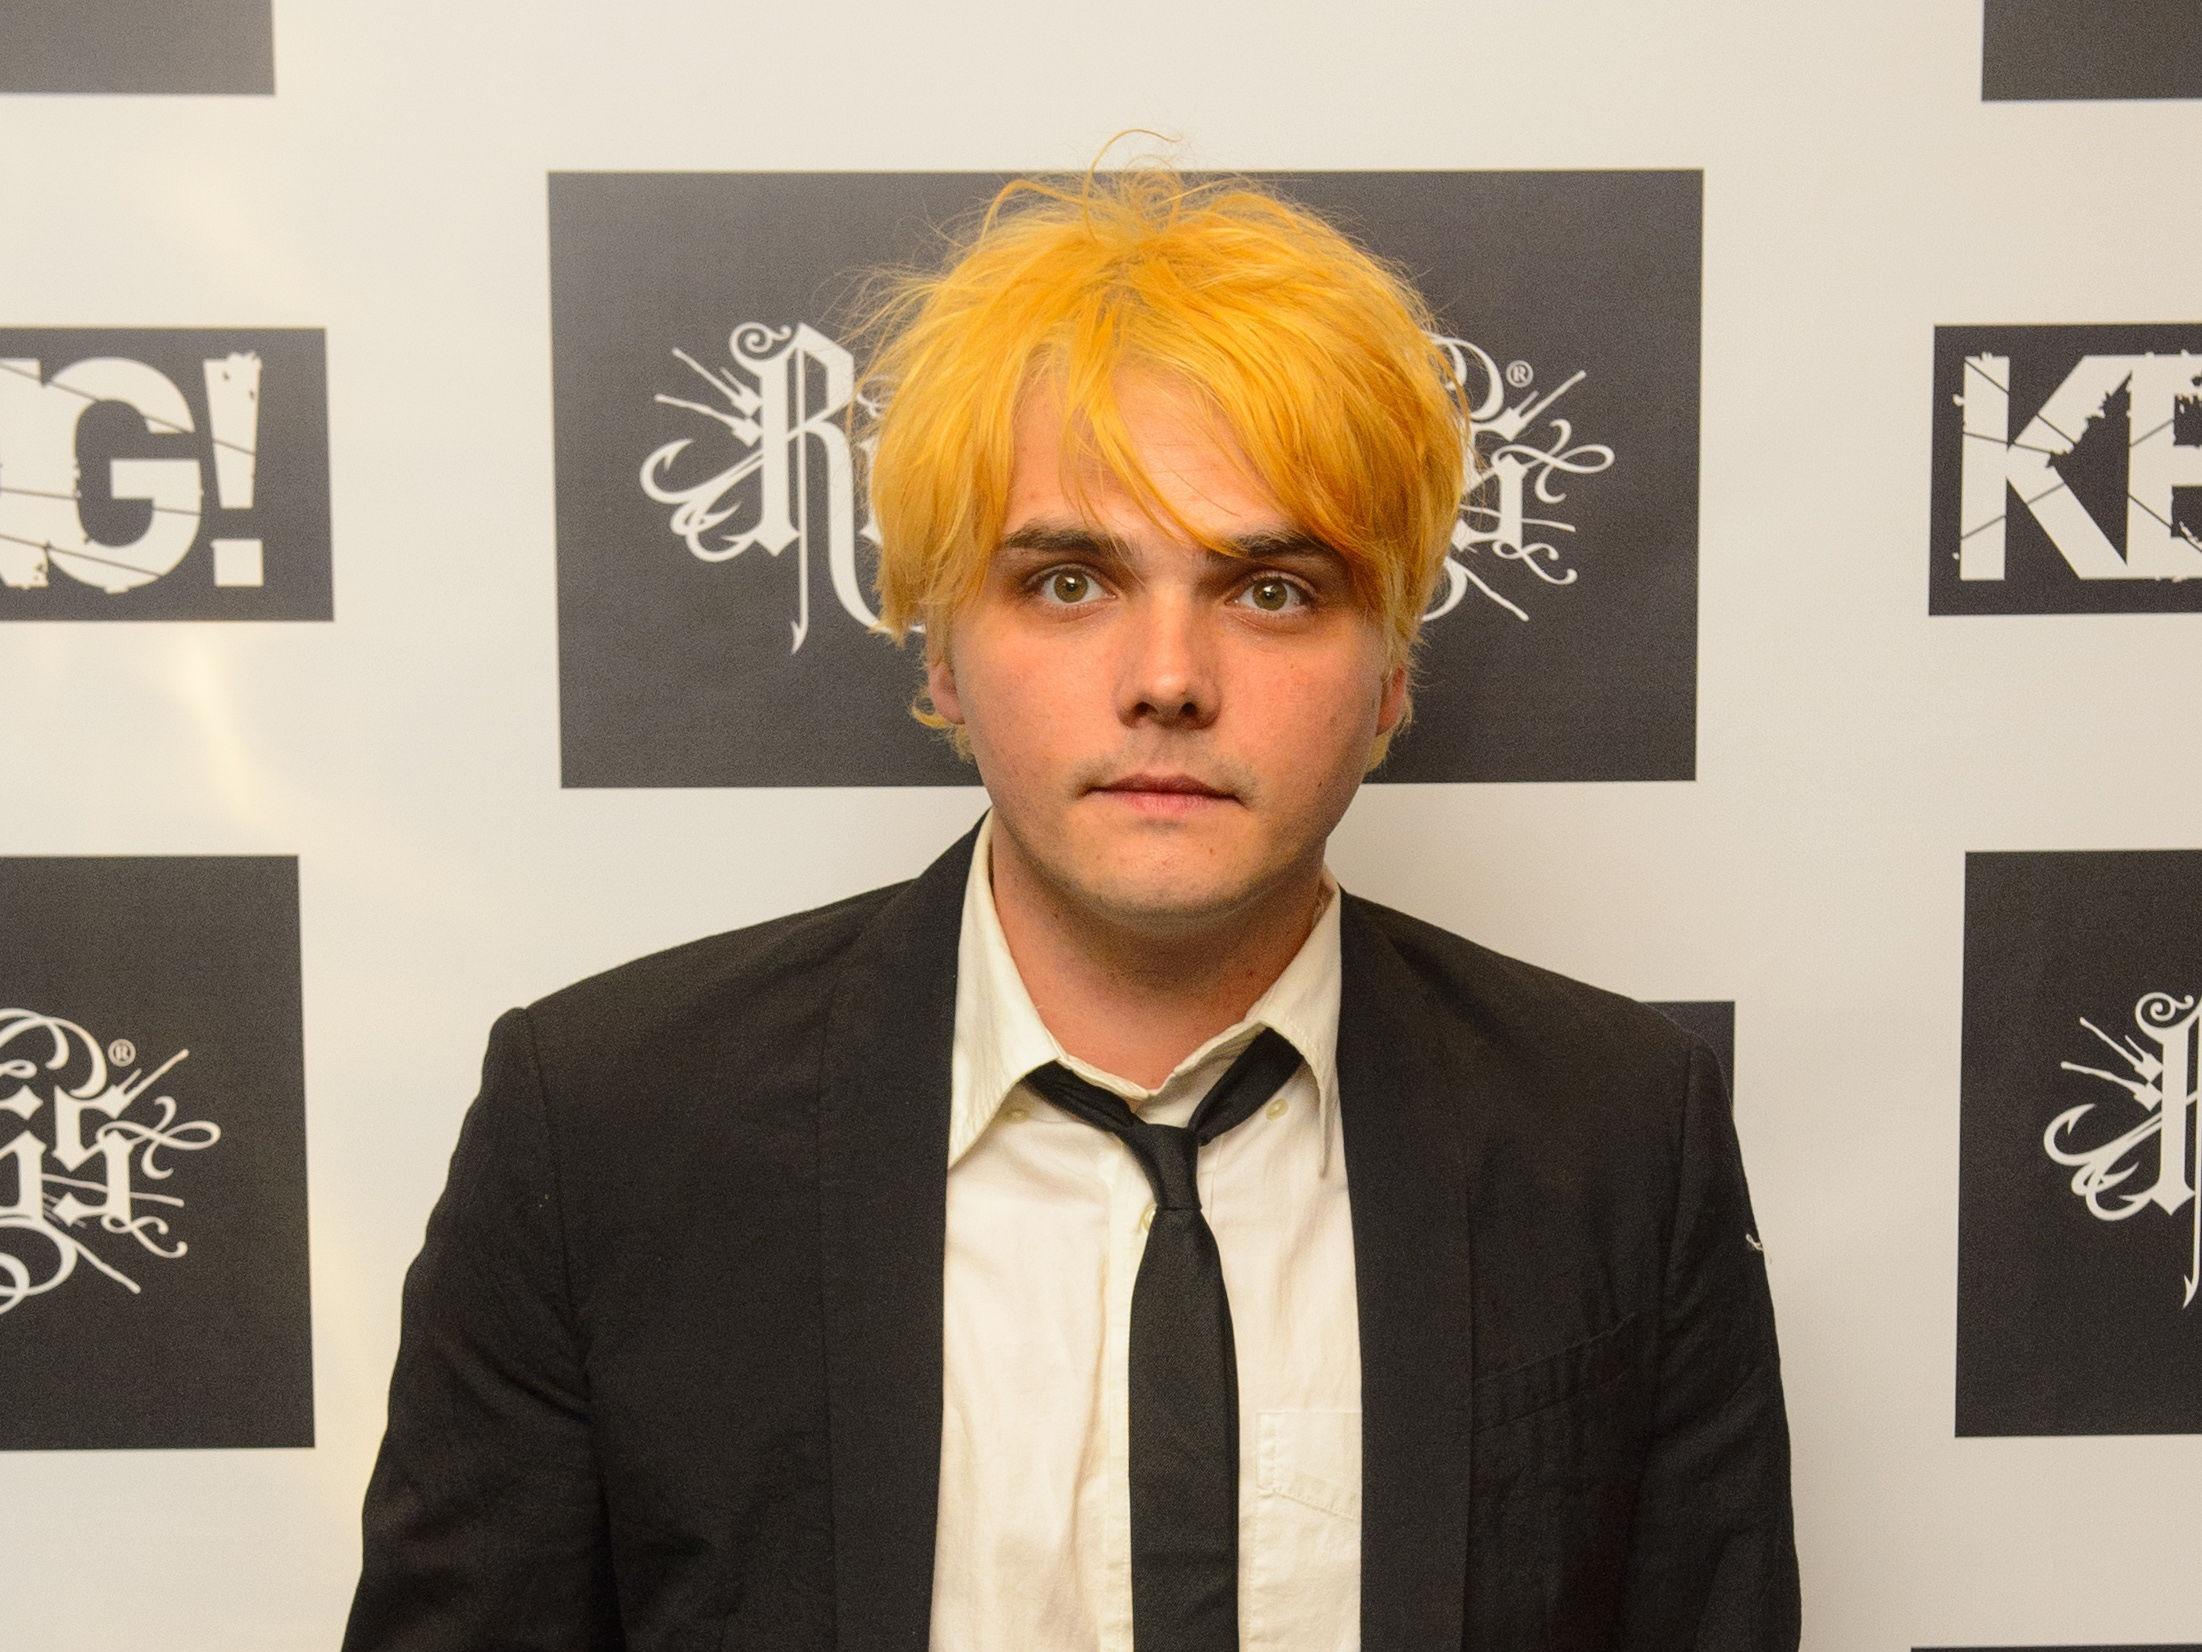 Gerard Way's Umbrella Academy comic lands live-action Netflix adaptation